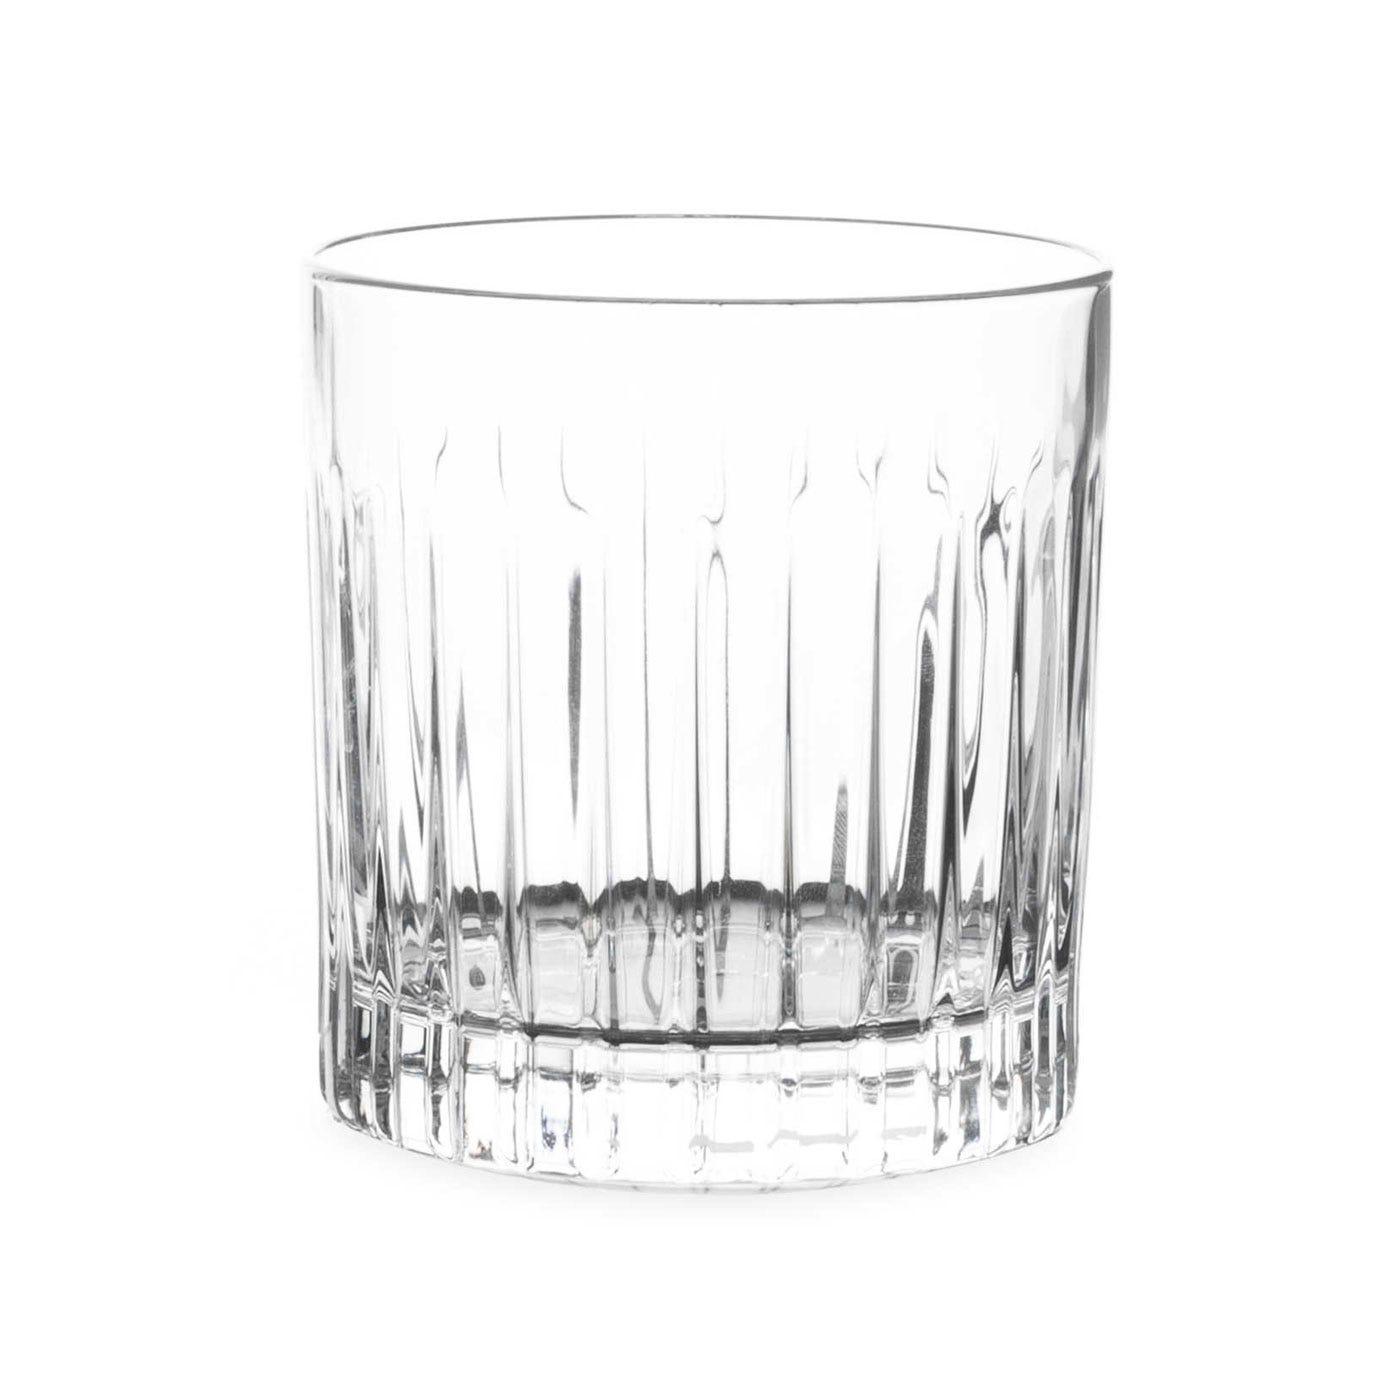 Timeless Crystal Whisky Tumbler